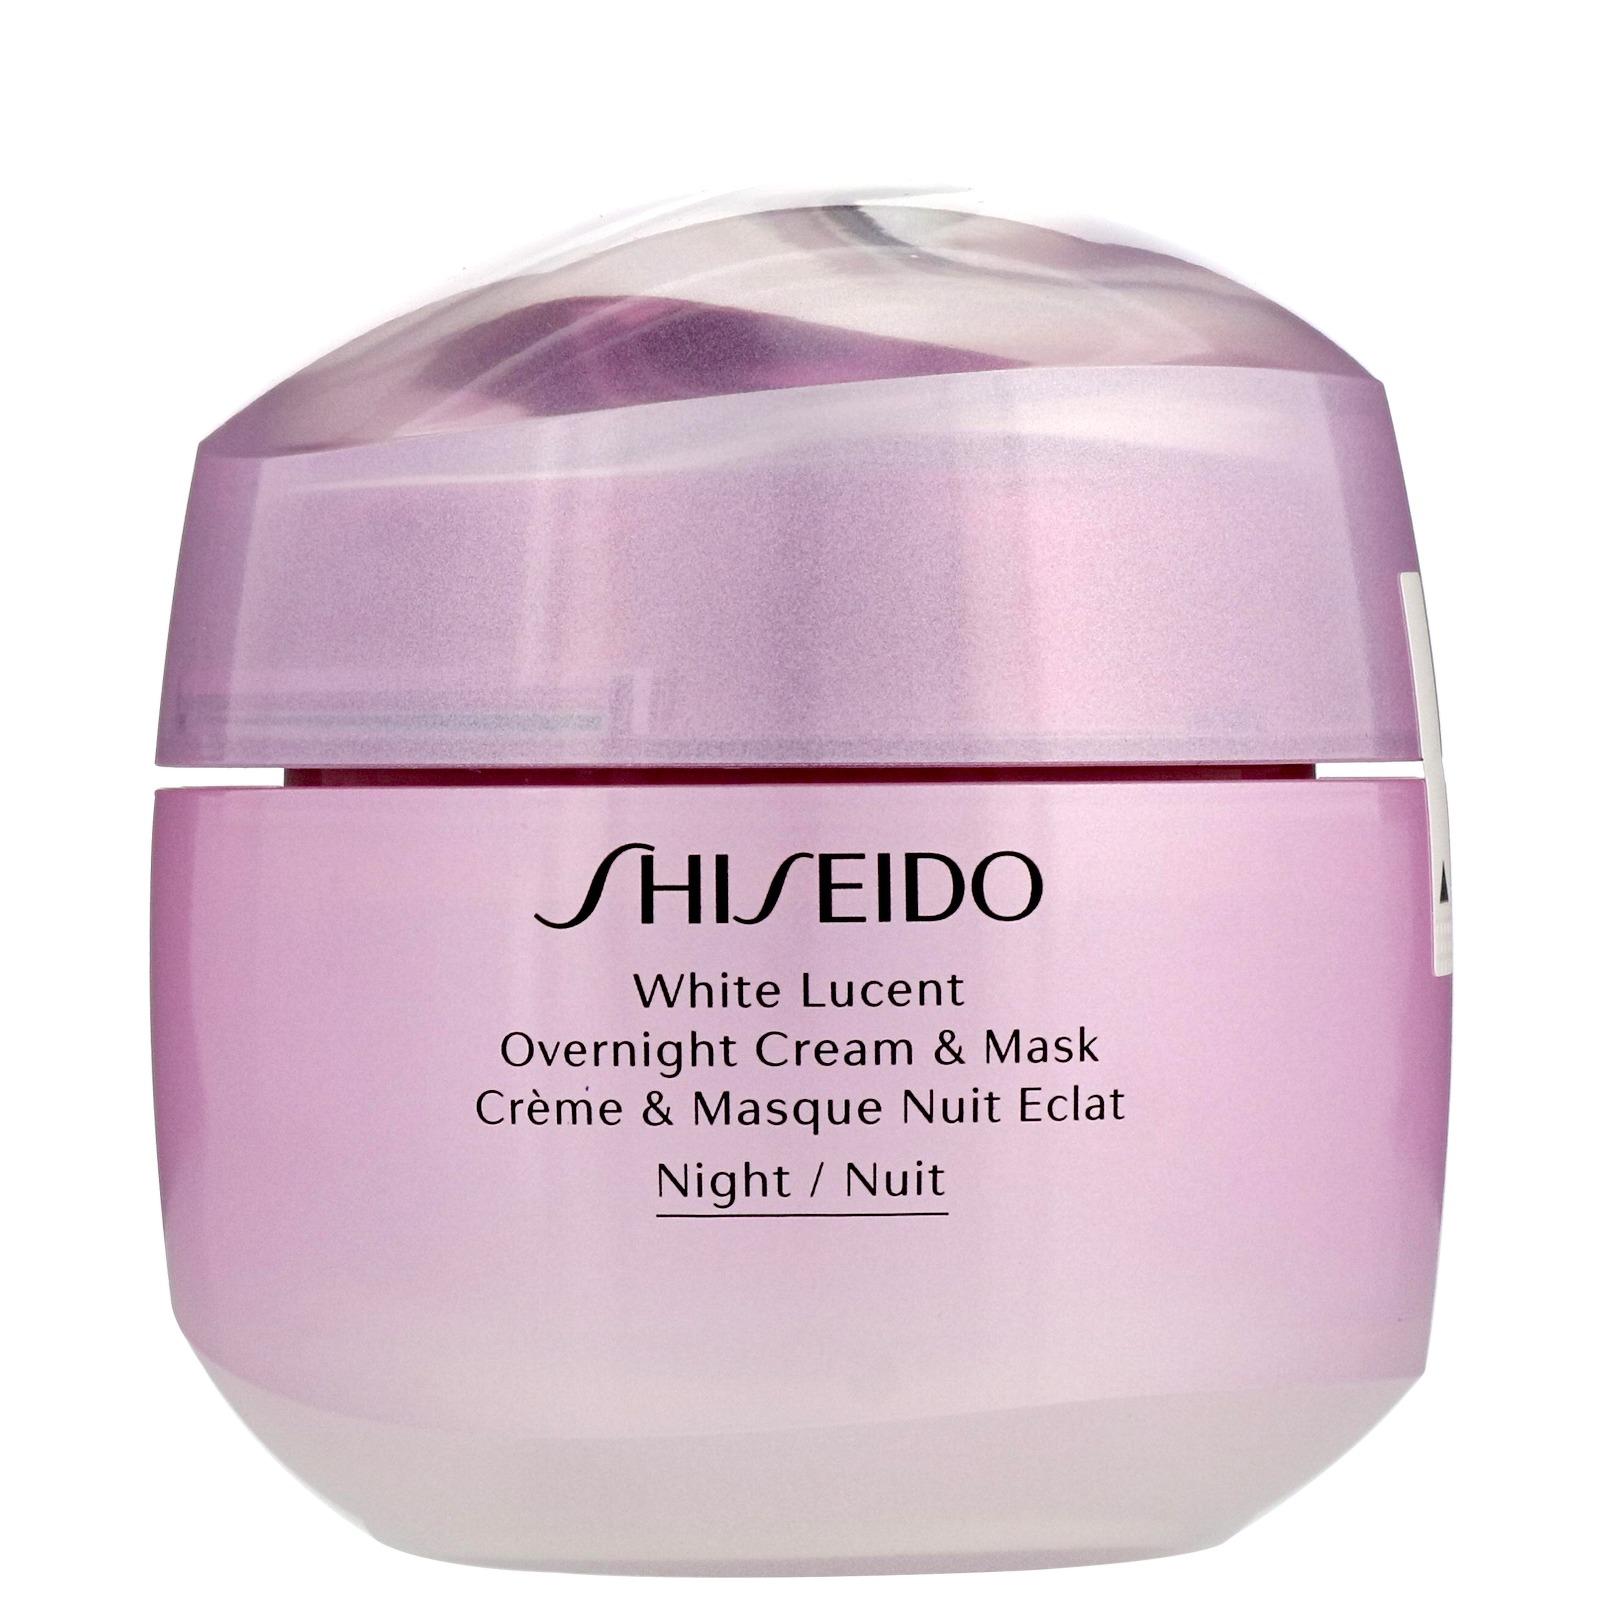 Shiseido White Lucent Overnight Cream & Mask  75 ml